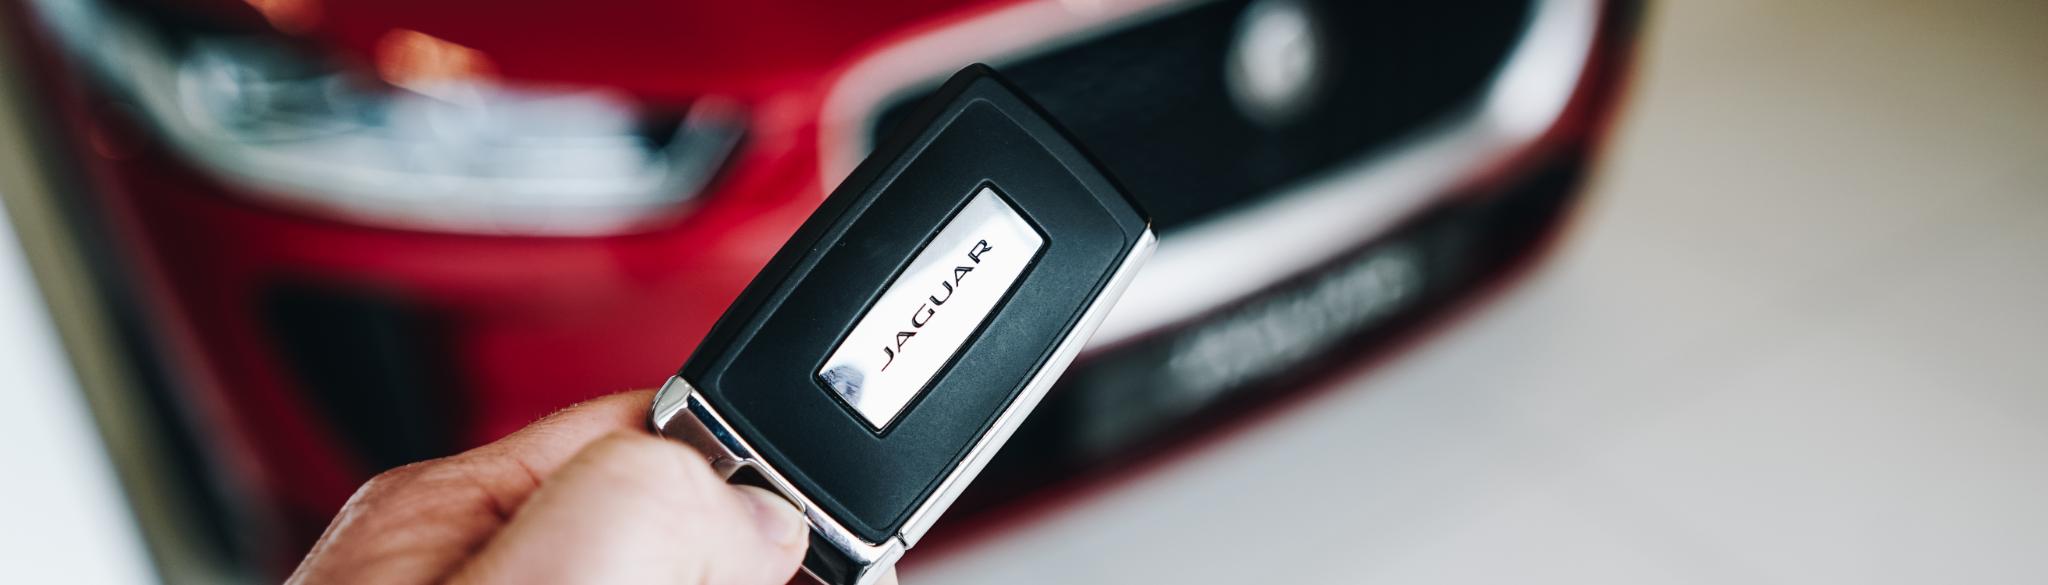 Dick Lovett Jaguar Melksham, Reasons A New Jaguar Is The Car For You